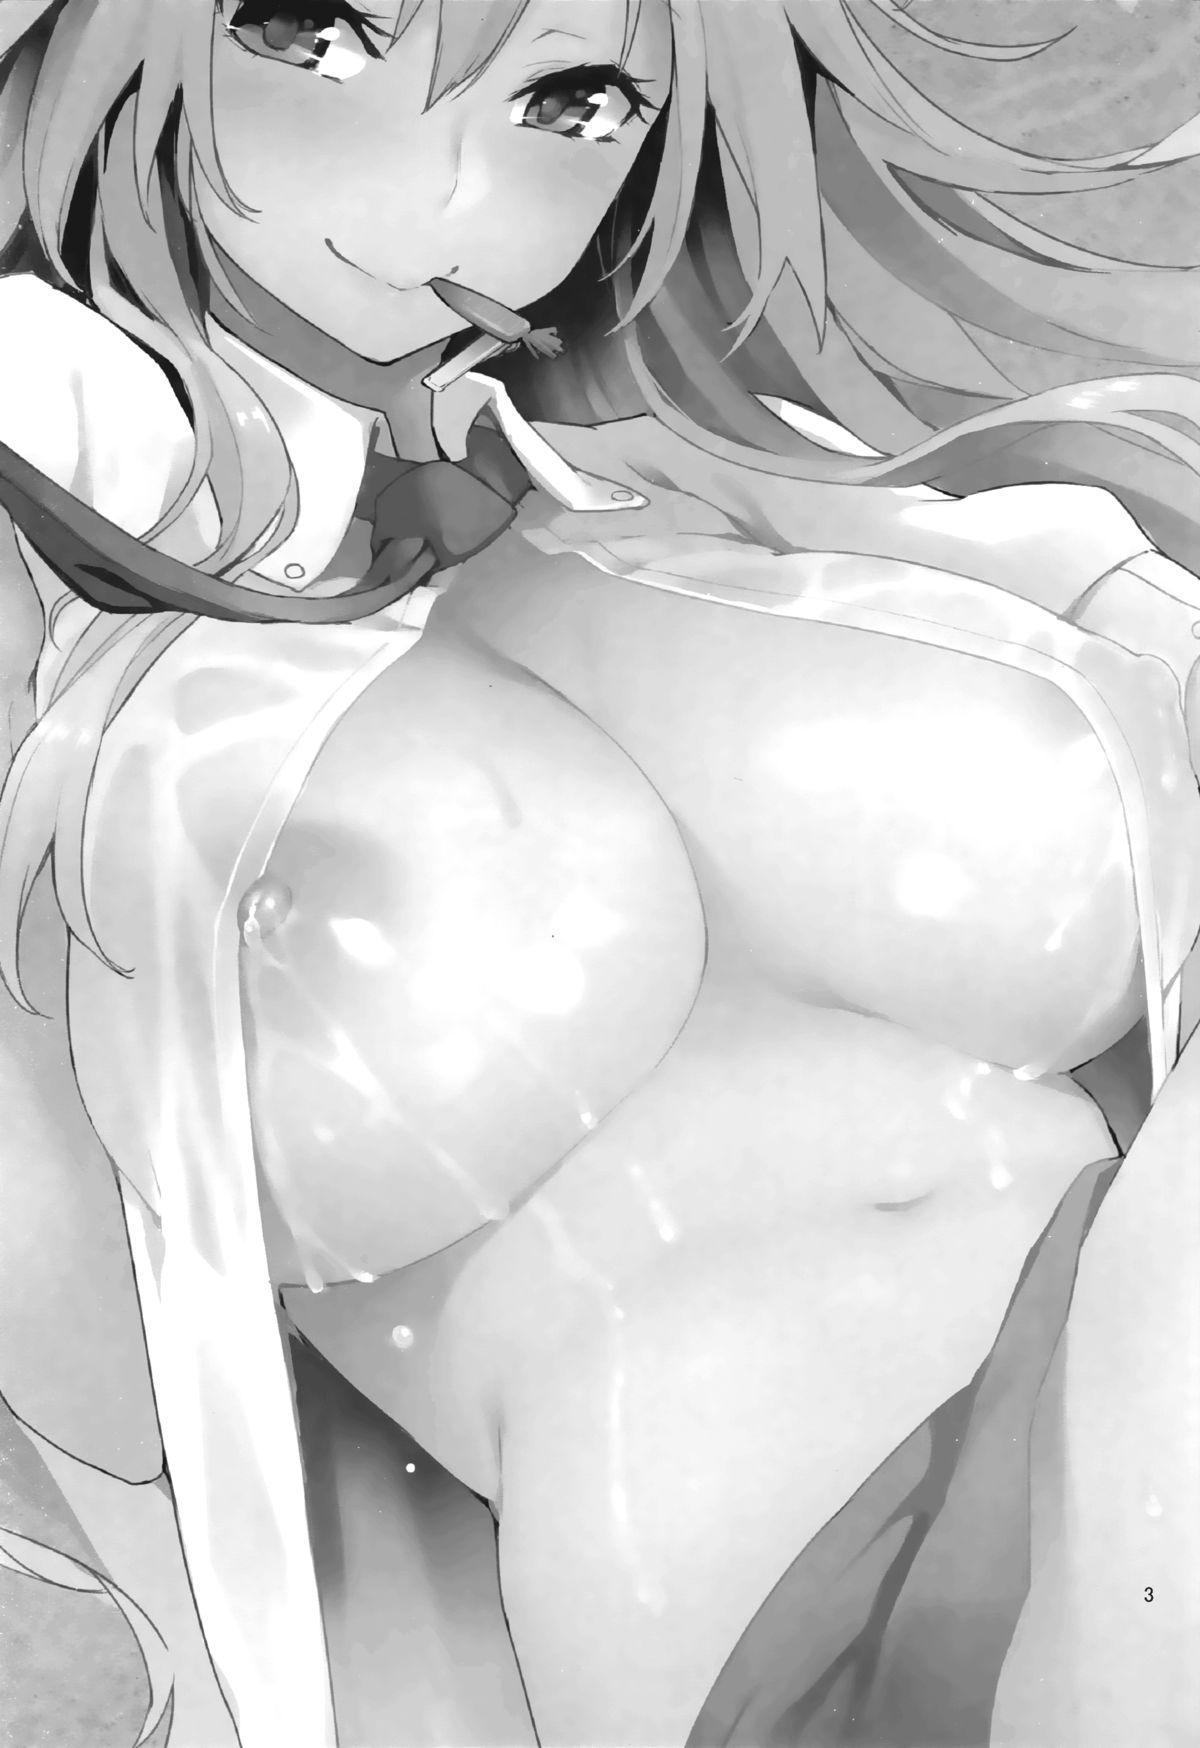 (C89) [Anmitsuyomogitei (Michiking)] Suwasete Kudasai Udonge-mama! | Let Me Suck On Them, Udonge-Mama! (Touhou Project) [English] [PSYN + Facedesk] 1